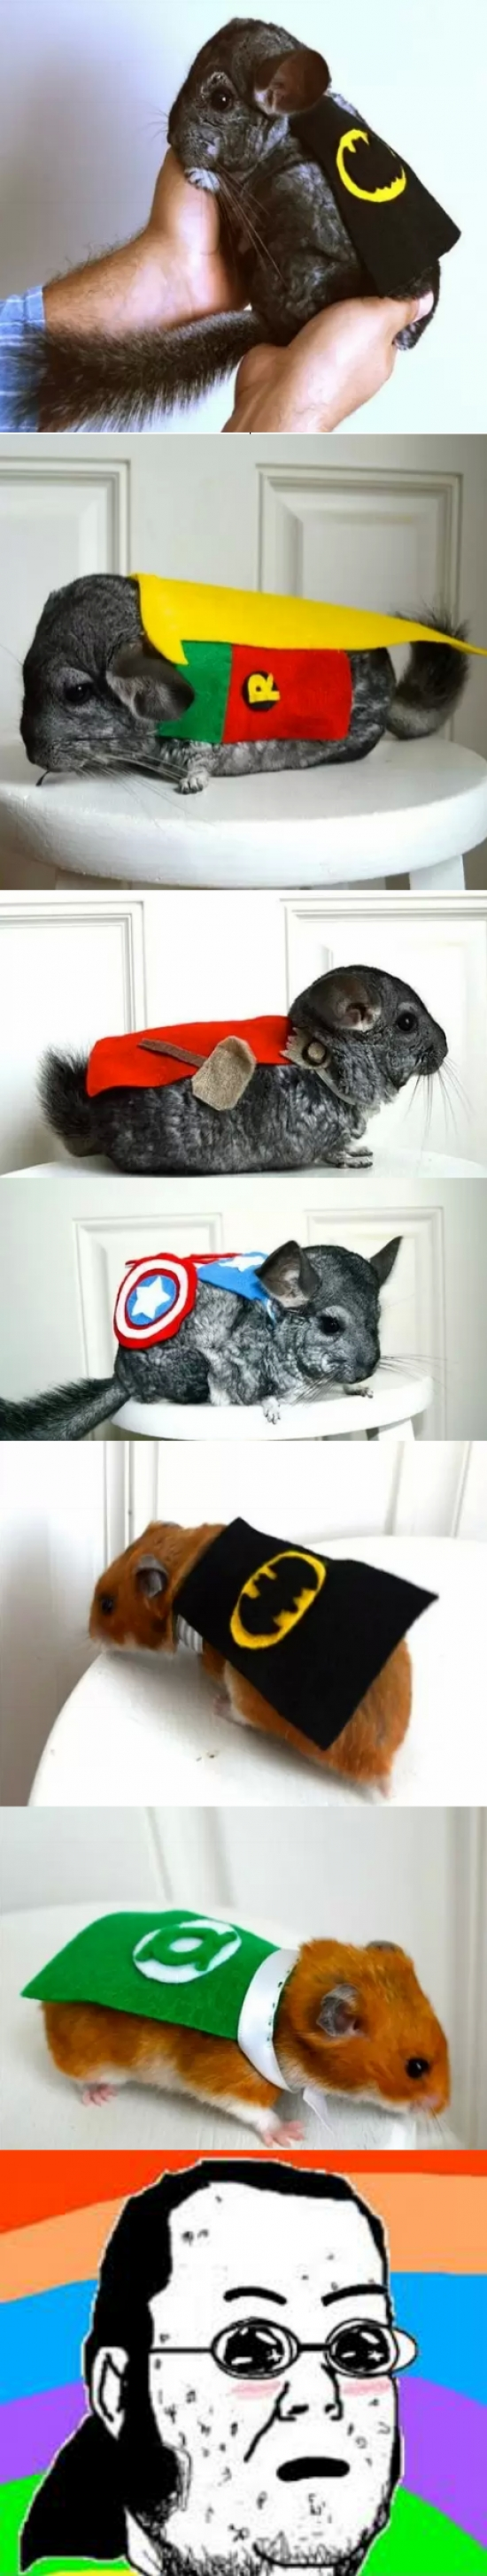 Friki - ¡Chinchillas vestidas de superheroes!